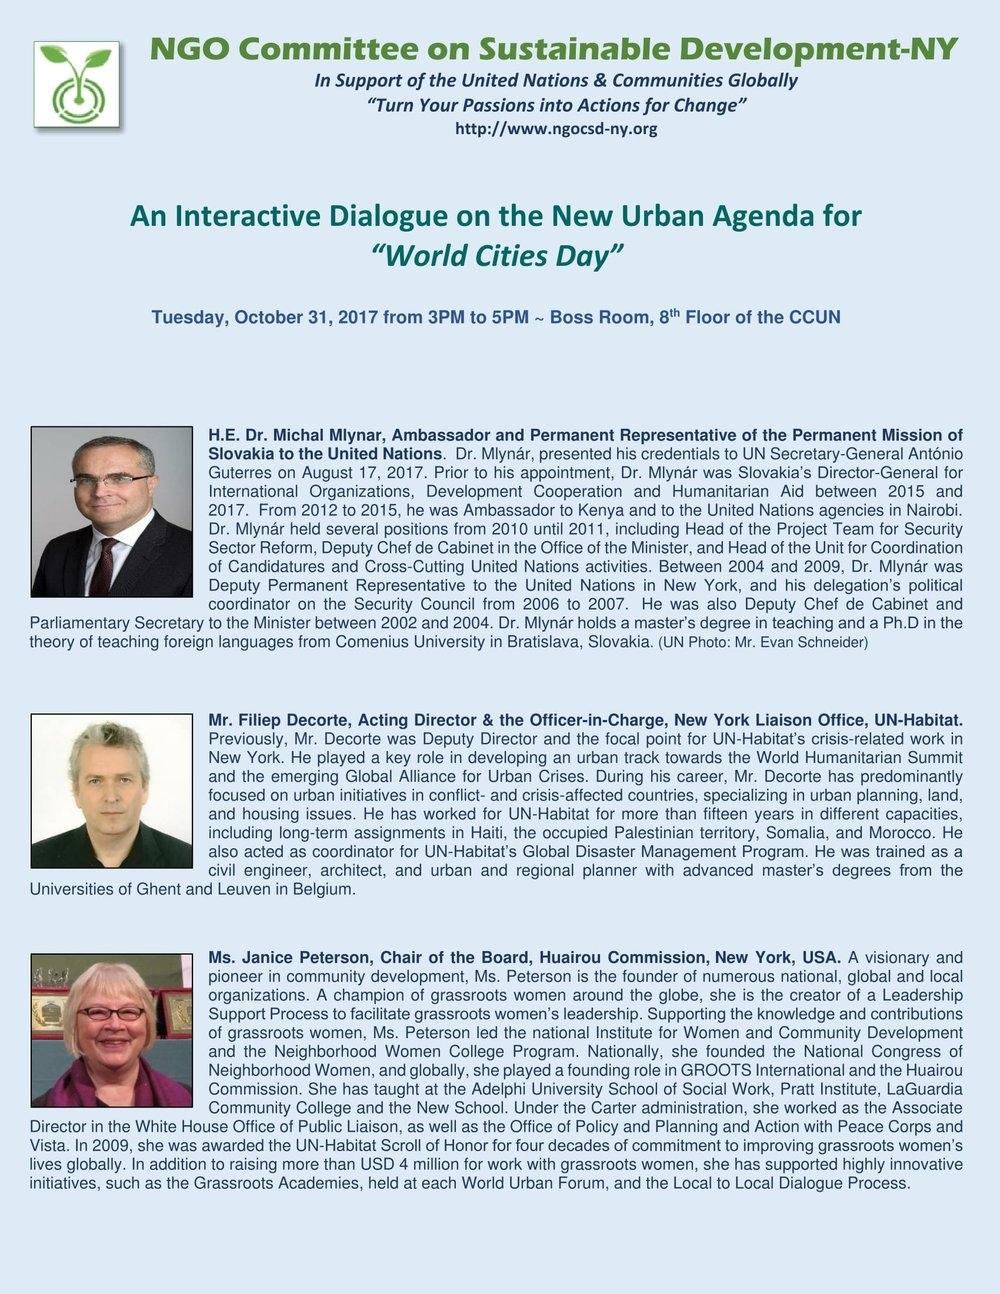 NGOCSD-NY+10-31-17+World+Cities+Day+Photos+&+Bios-A1-1 2.jpg